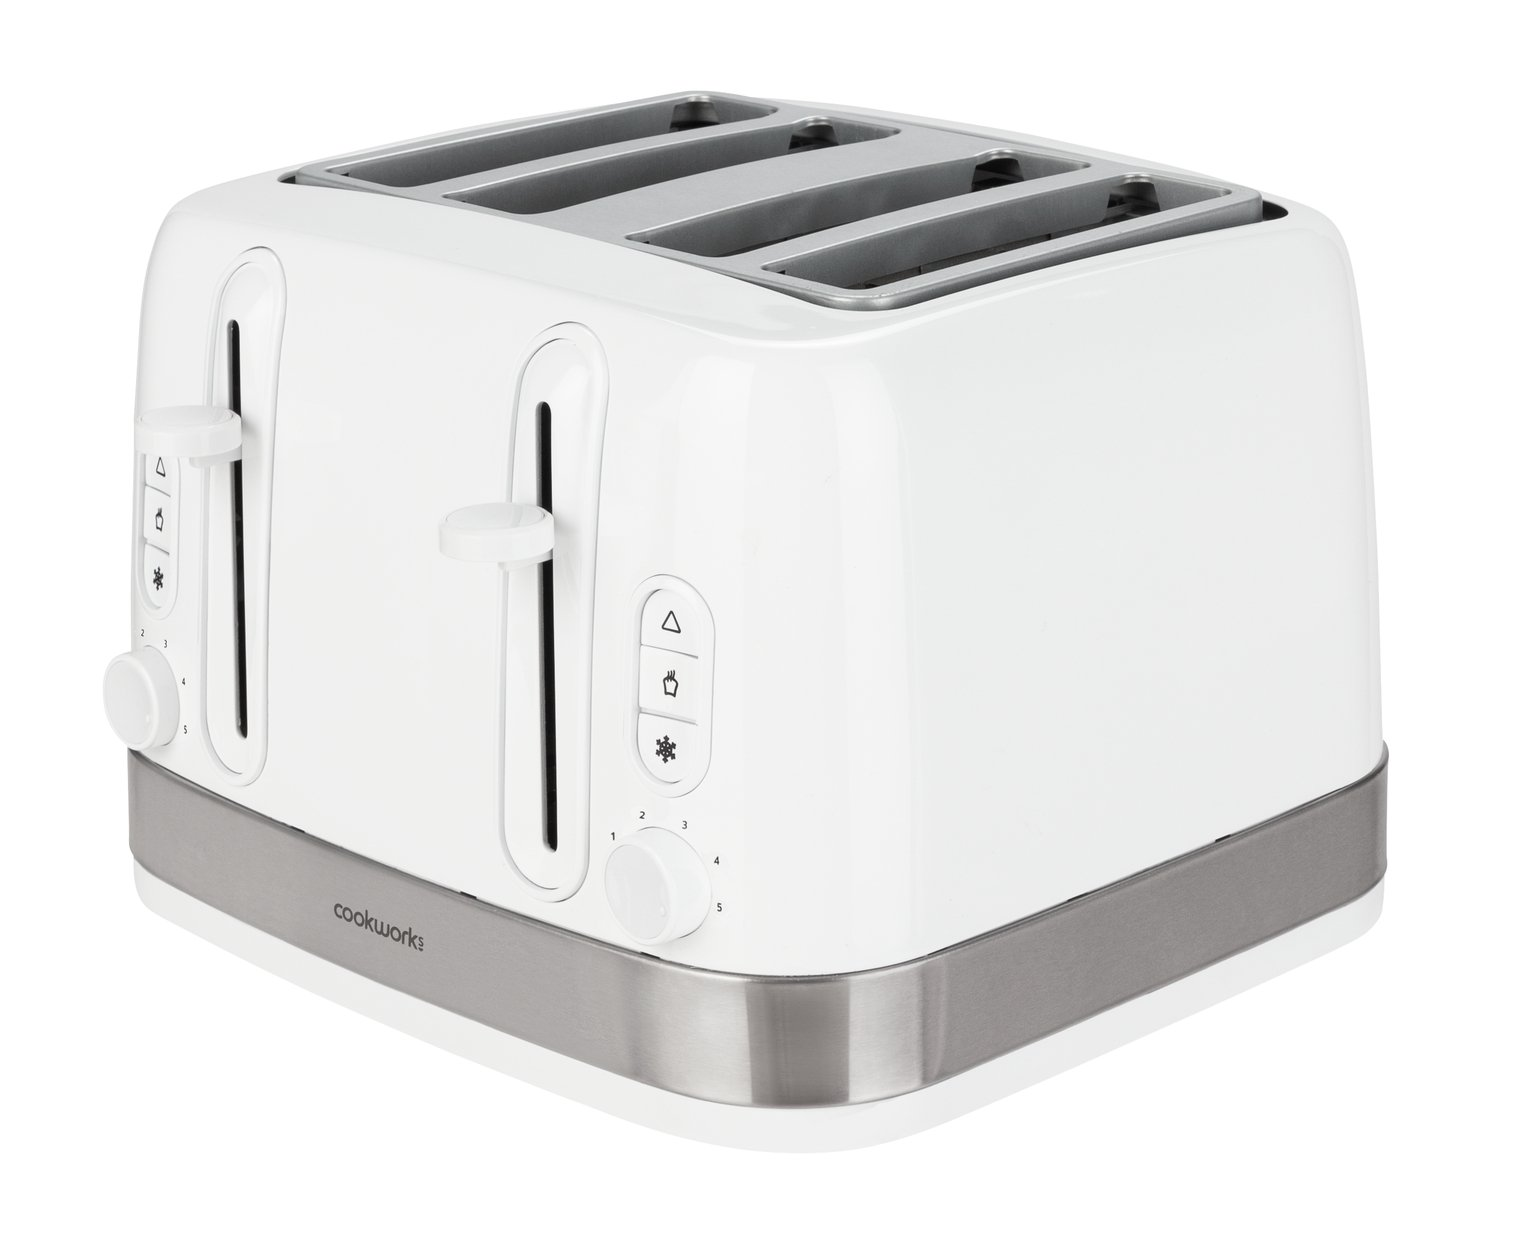 Cookworks Illuminated 4 Slice Toaster - White